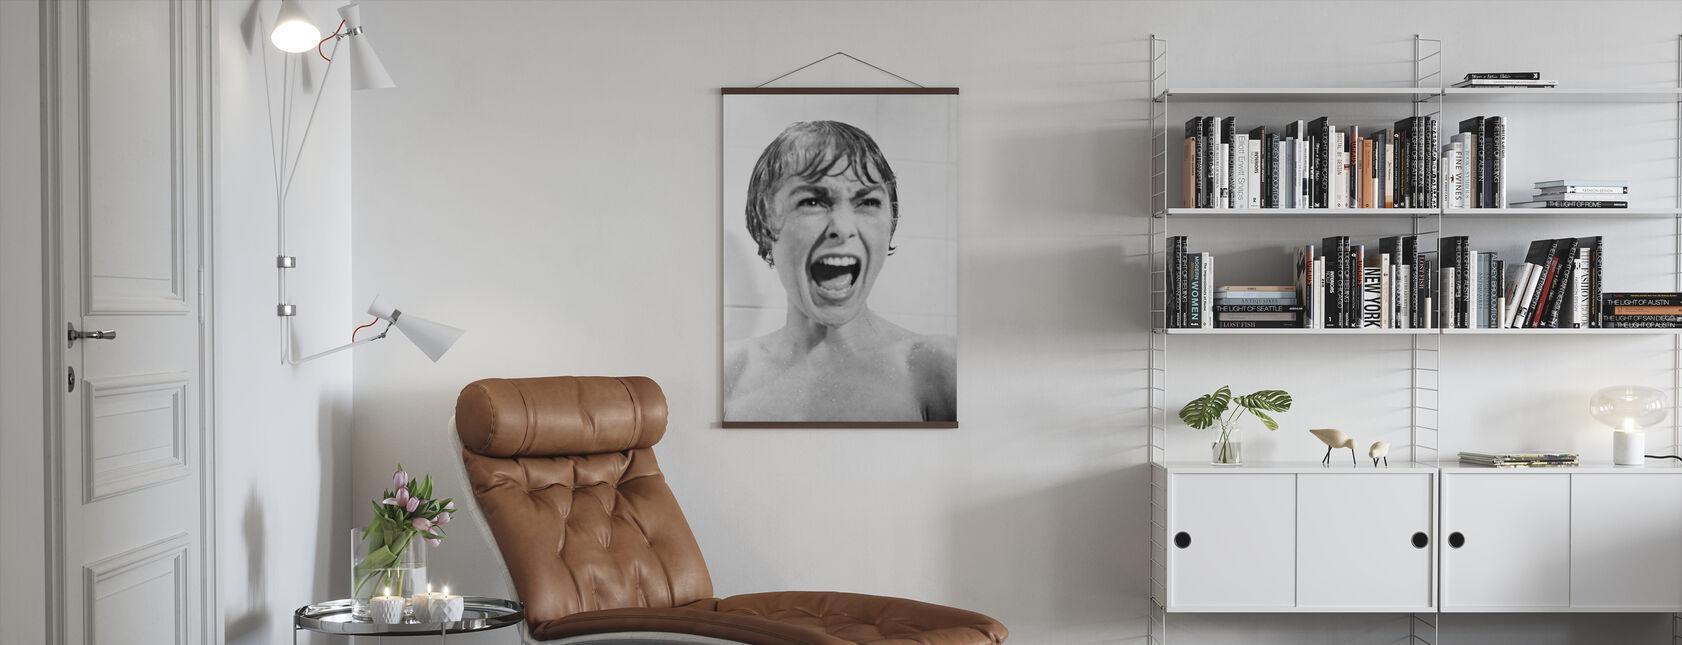 Janet Leigh in Psycho - Poster - Wohnzimmer